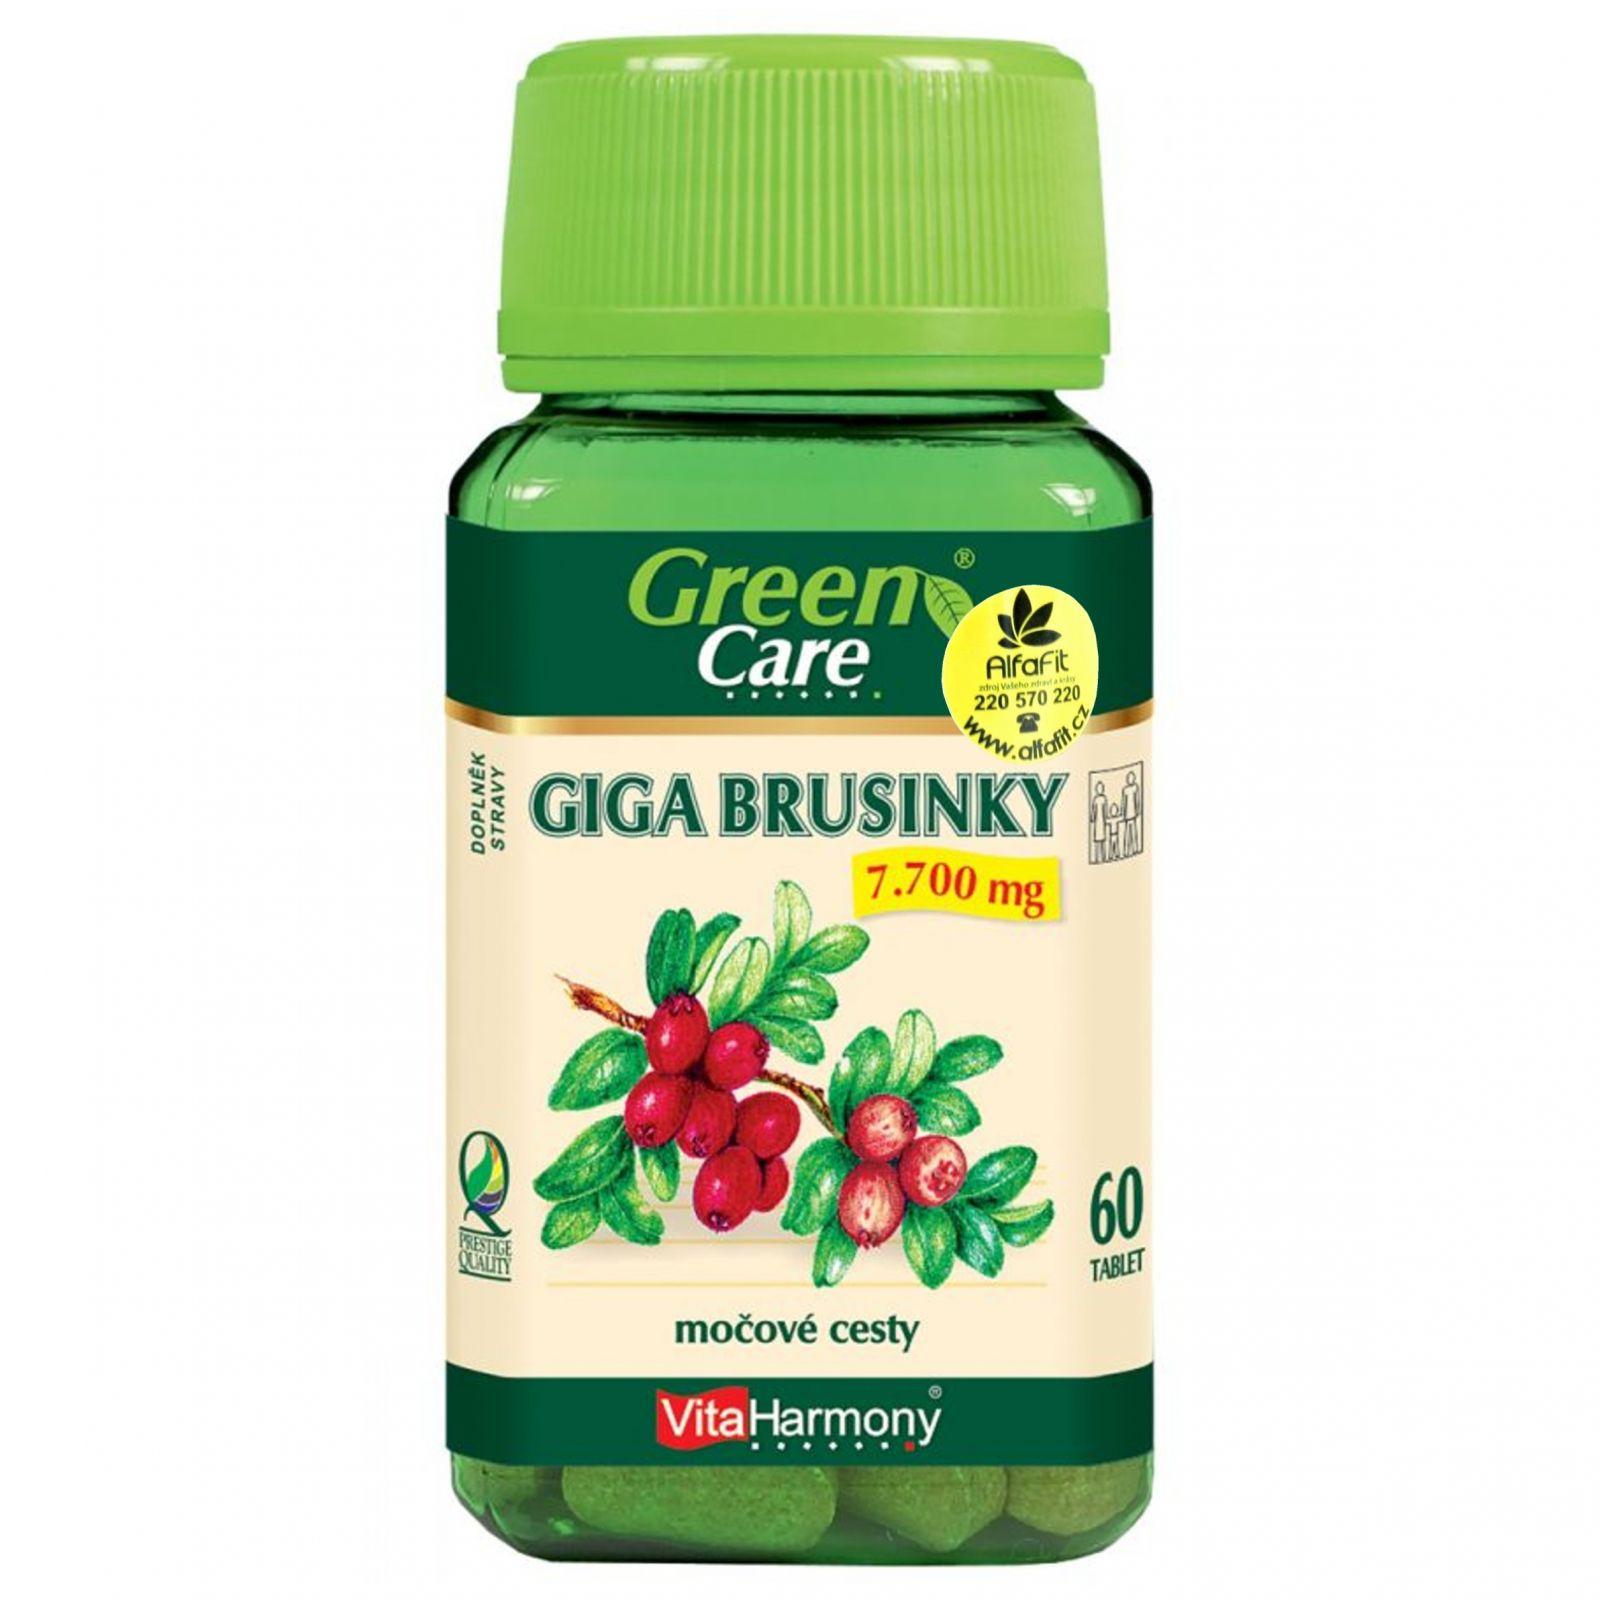 VitaHarmony Giga brusinky 7700 mg - 60 tablet